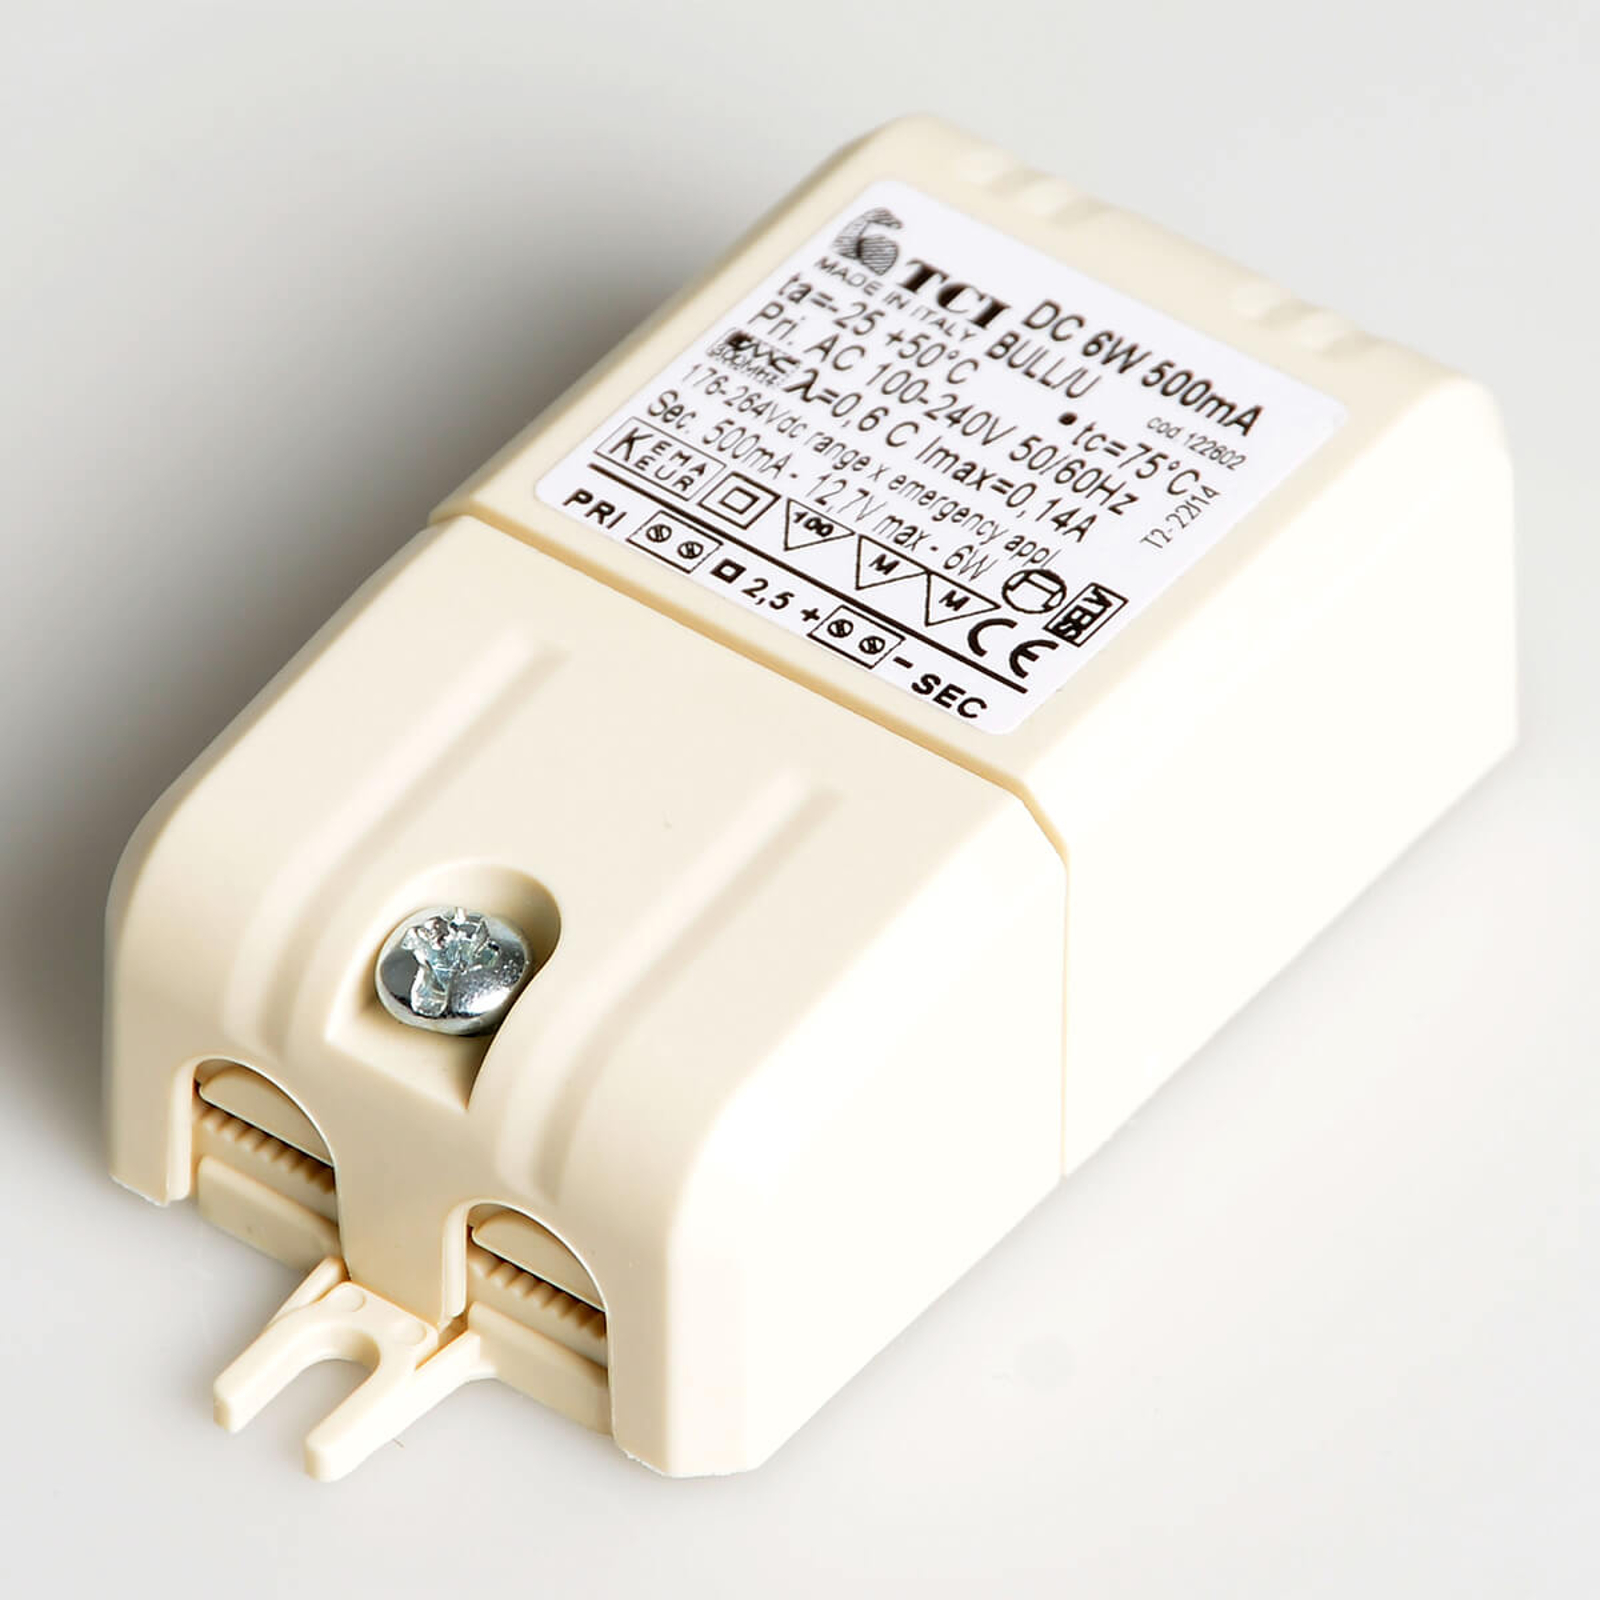 Convertisseur LED sonnette boîte lettres Letterman